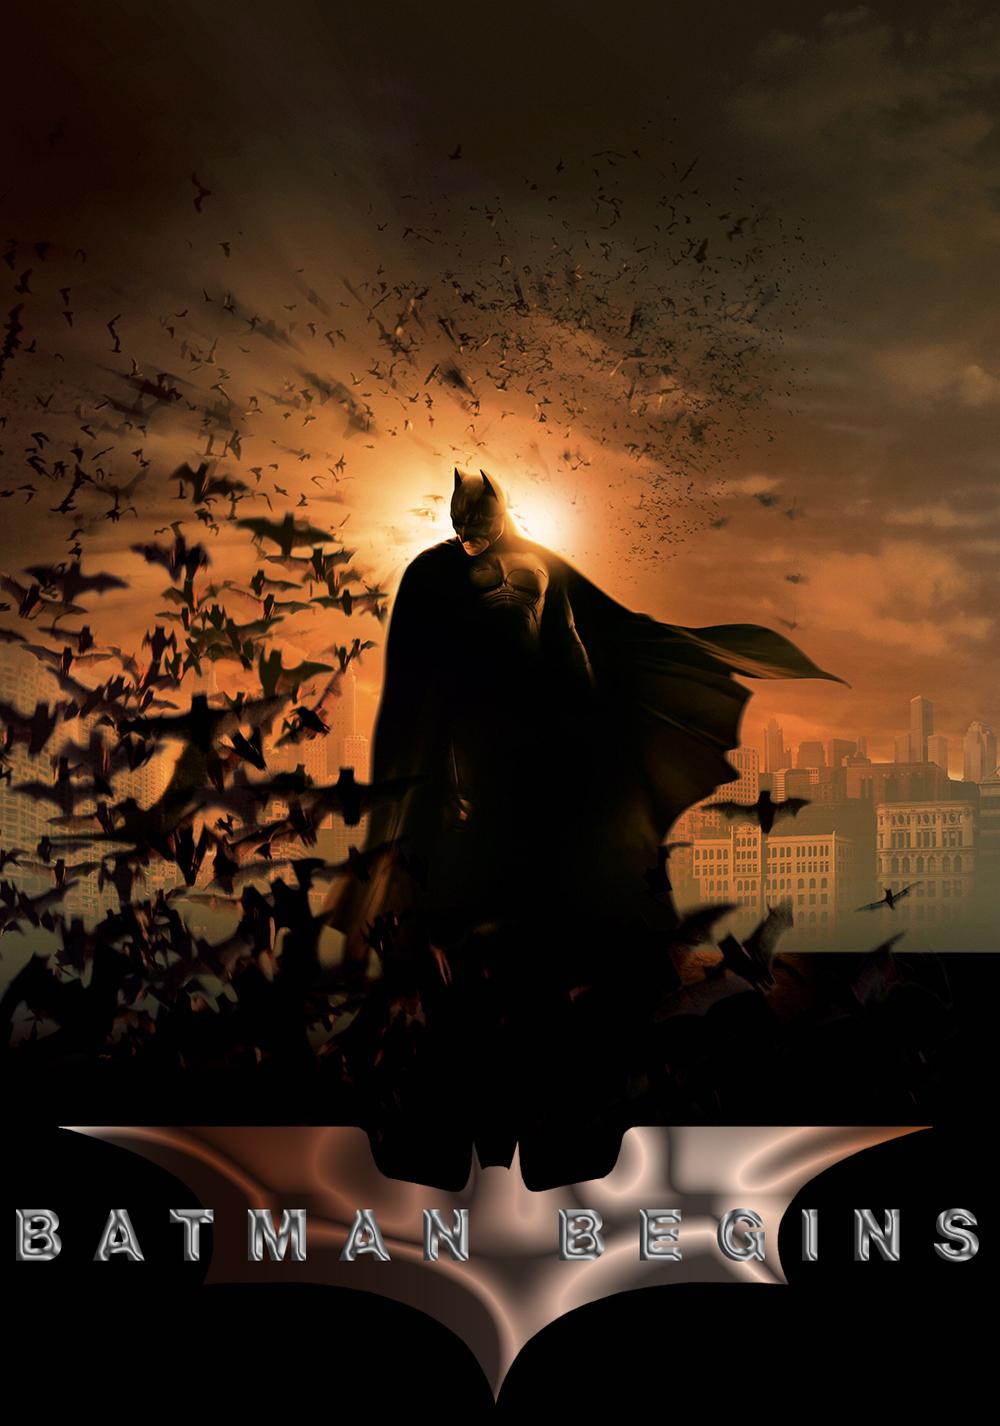 batman bigines and the oddesy Batman begins essay  essay on batman bigines and the oddesy  this conveys the meaning that although batman begins is a superhero film, batman's.